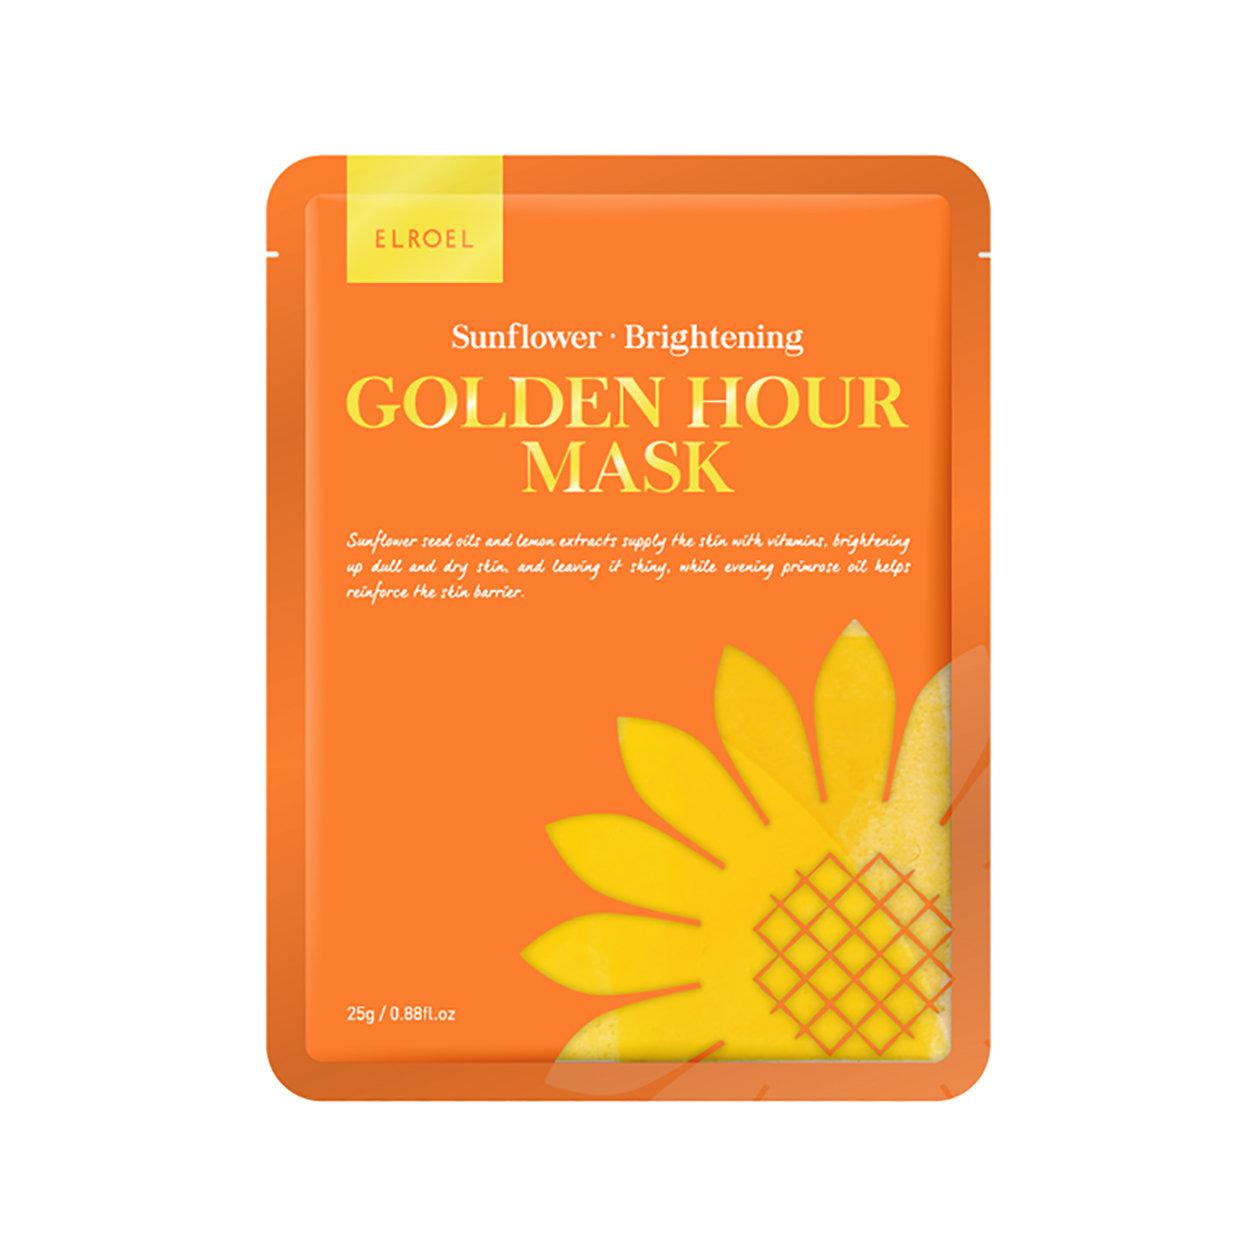 Image of 5 Maschere Monouso Golden Hour - Sunflower